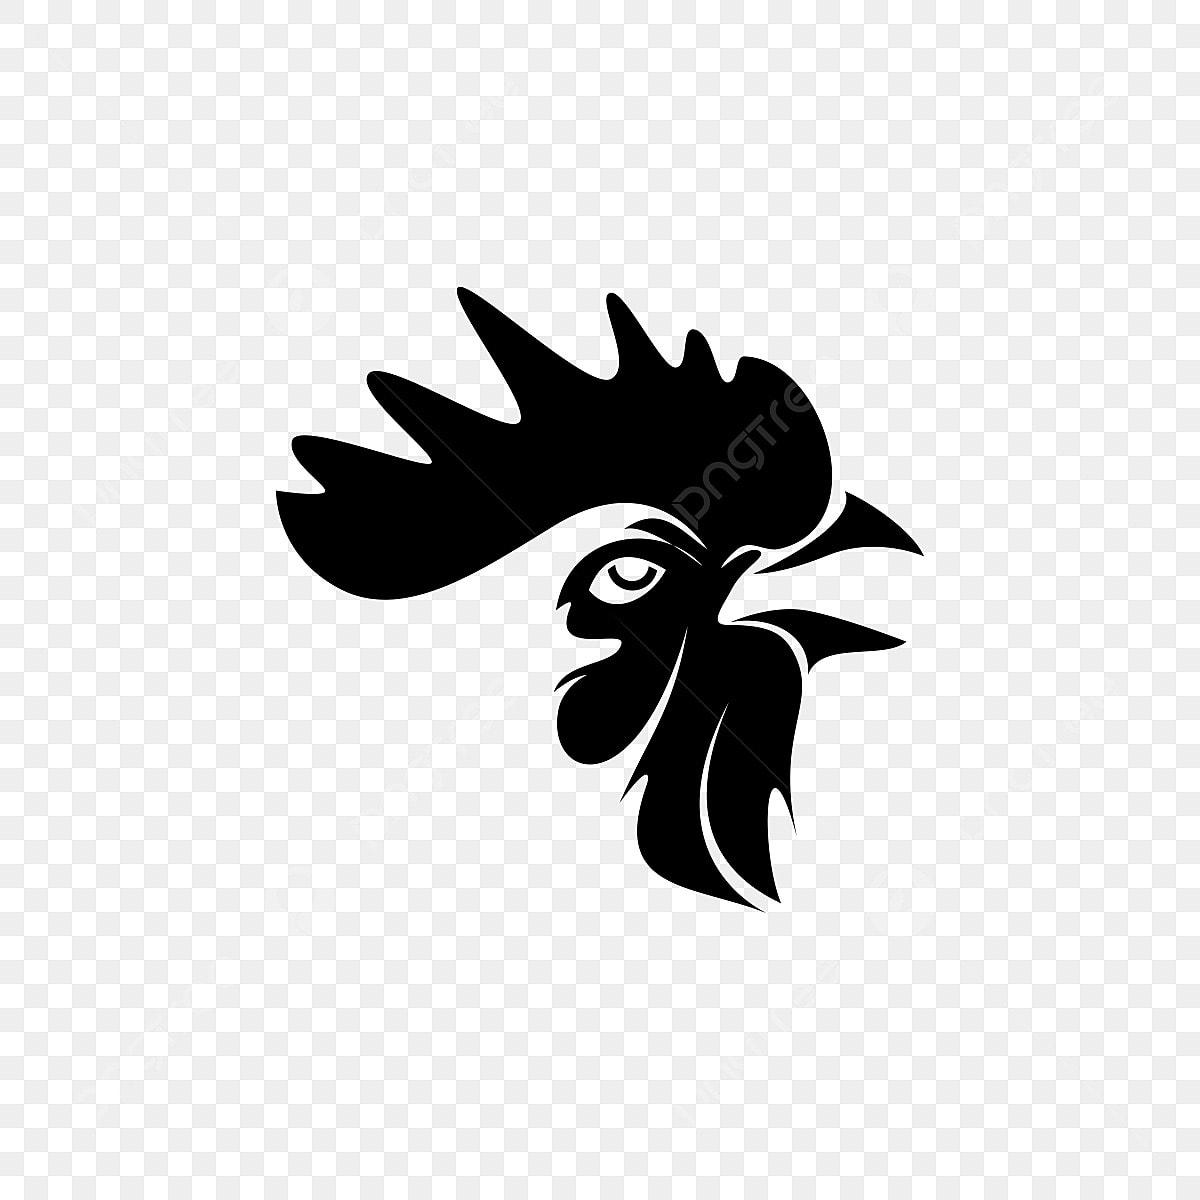 Gallo Cabeza Silueta, Agricultura, Animal, Arte PNG y ... (1200 x 1200 Pixel)